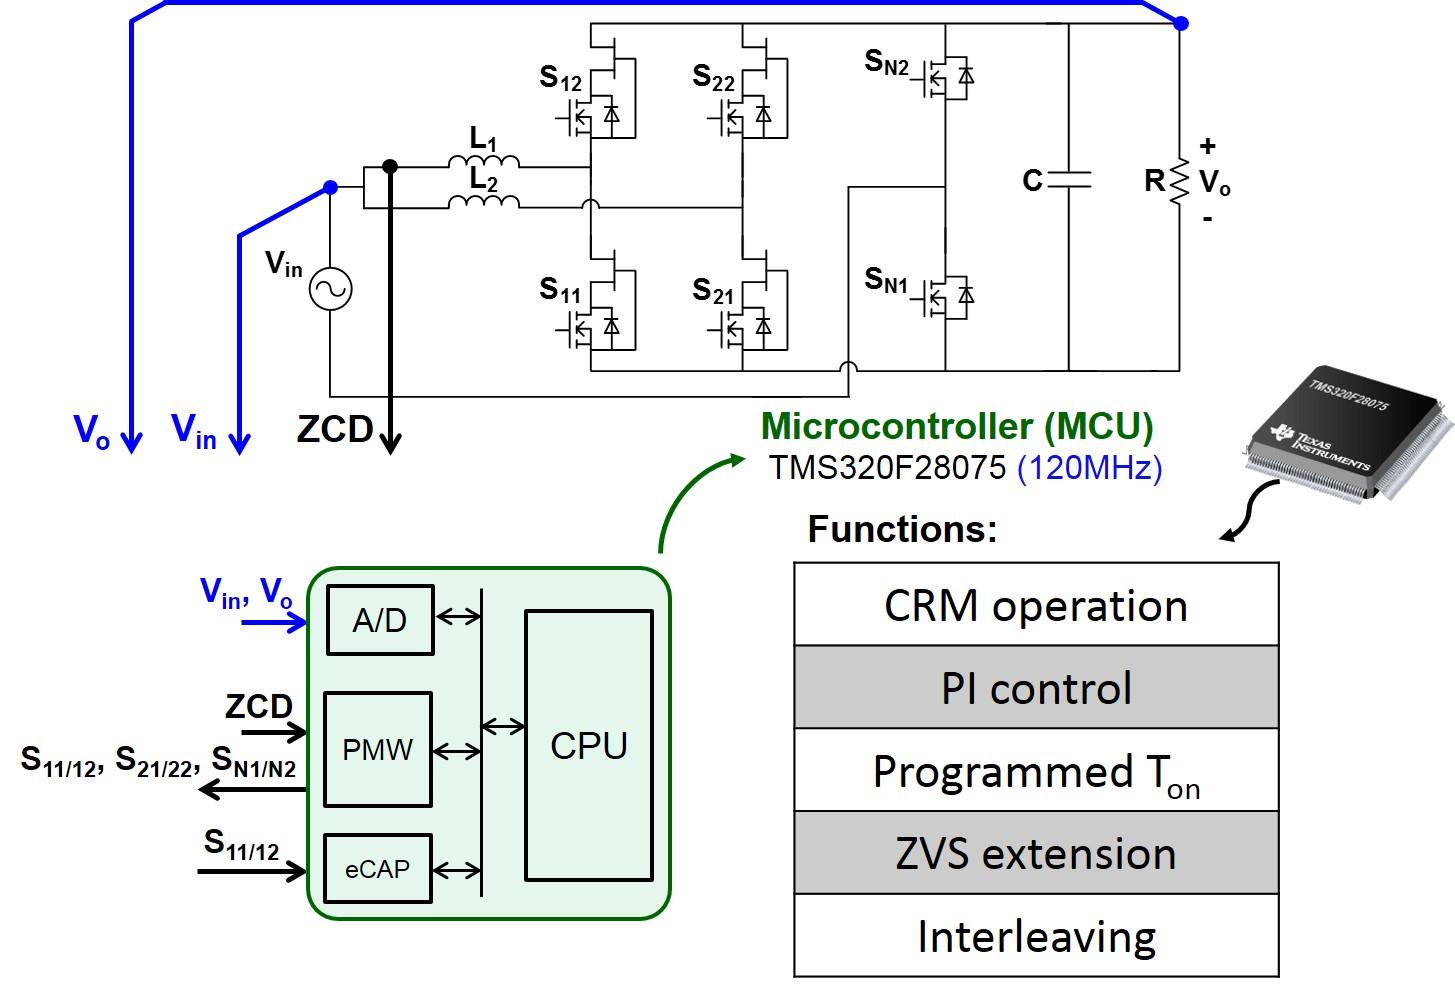 Image of MCU-based digital control implementation